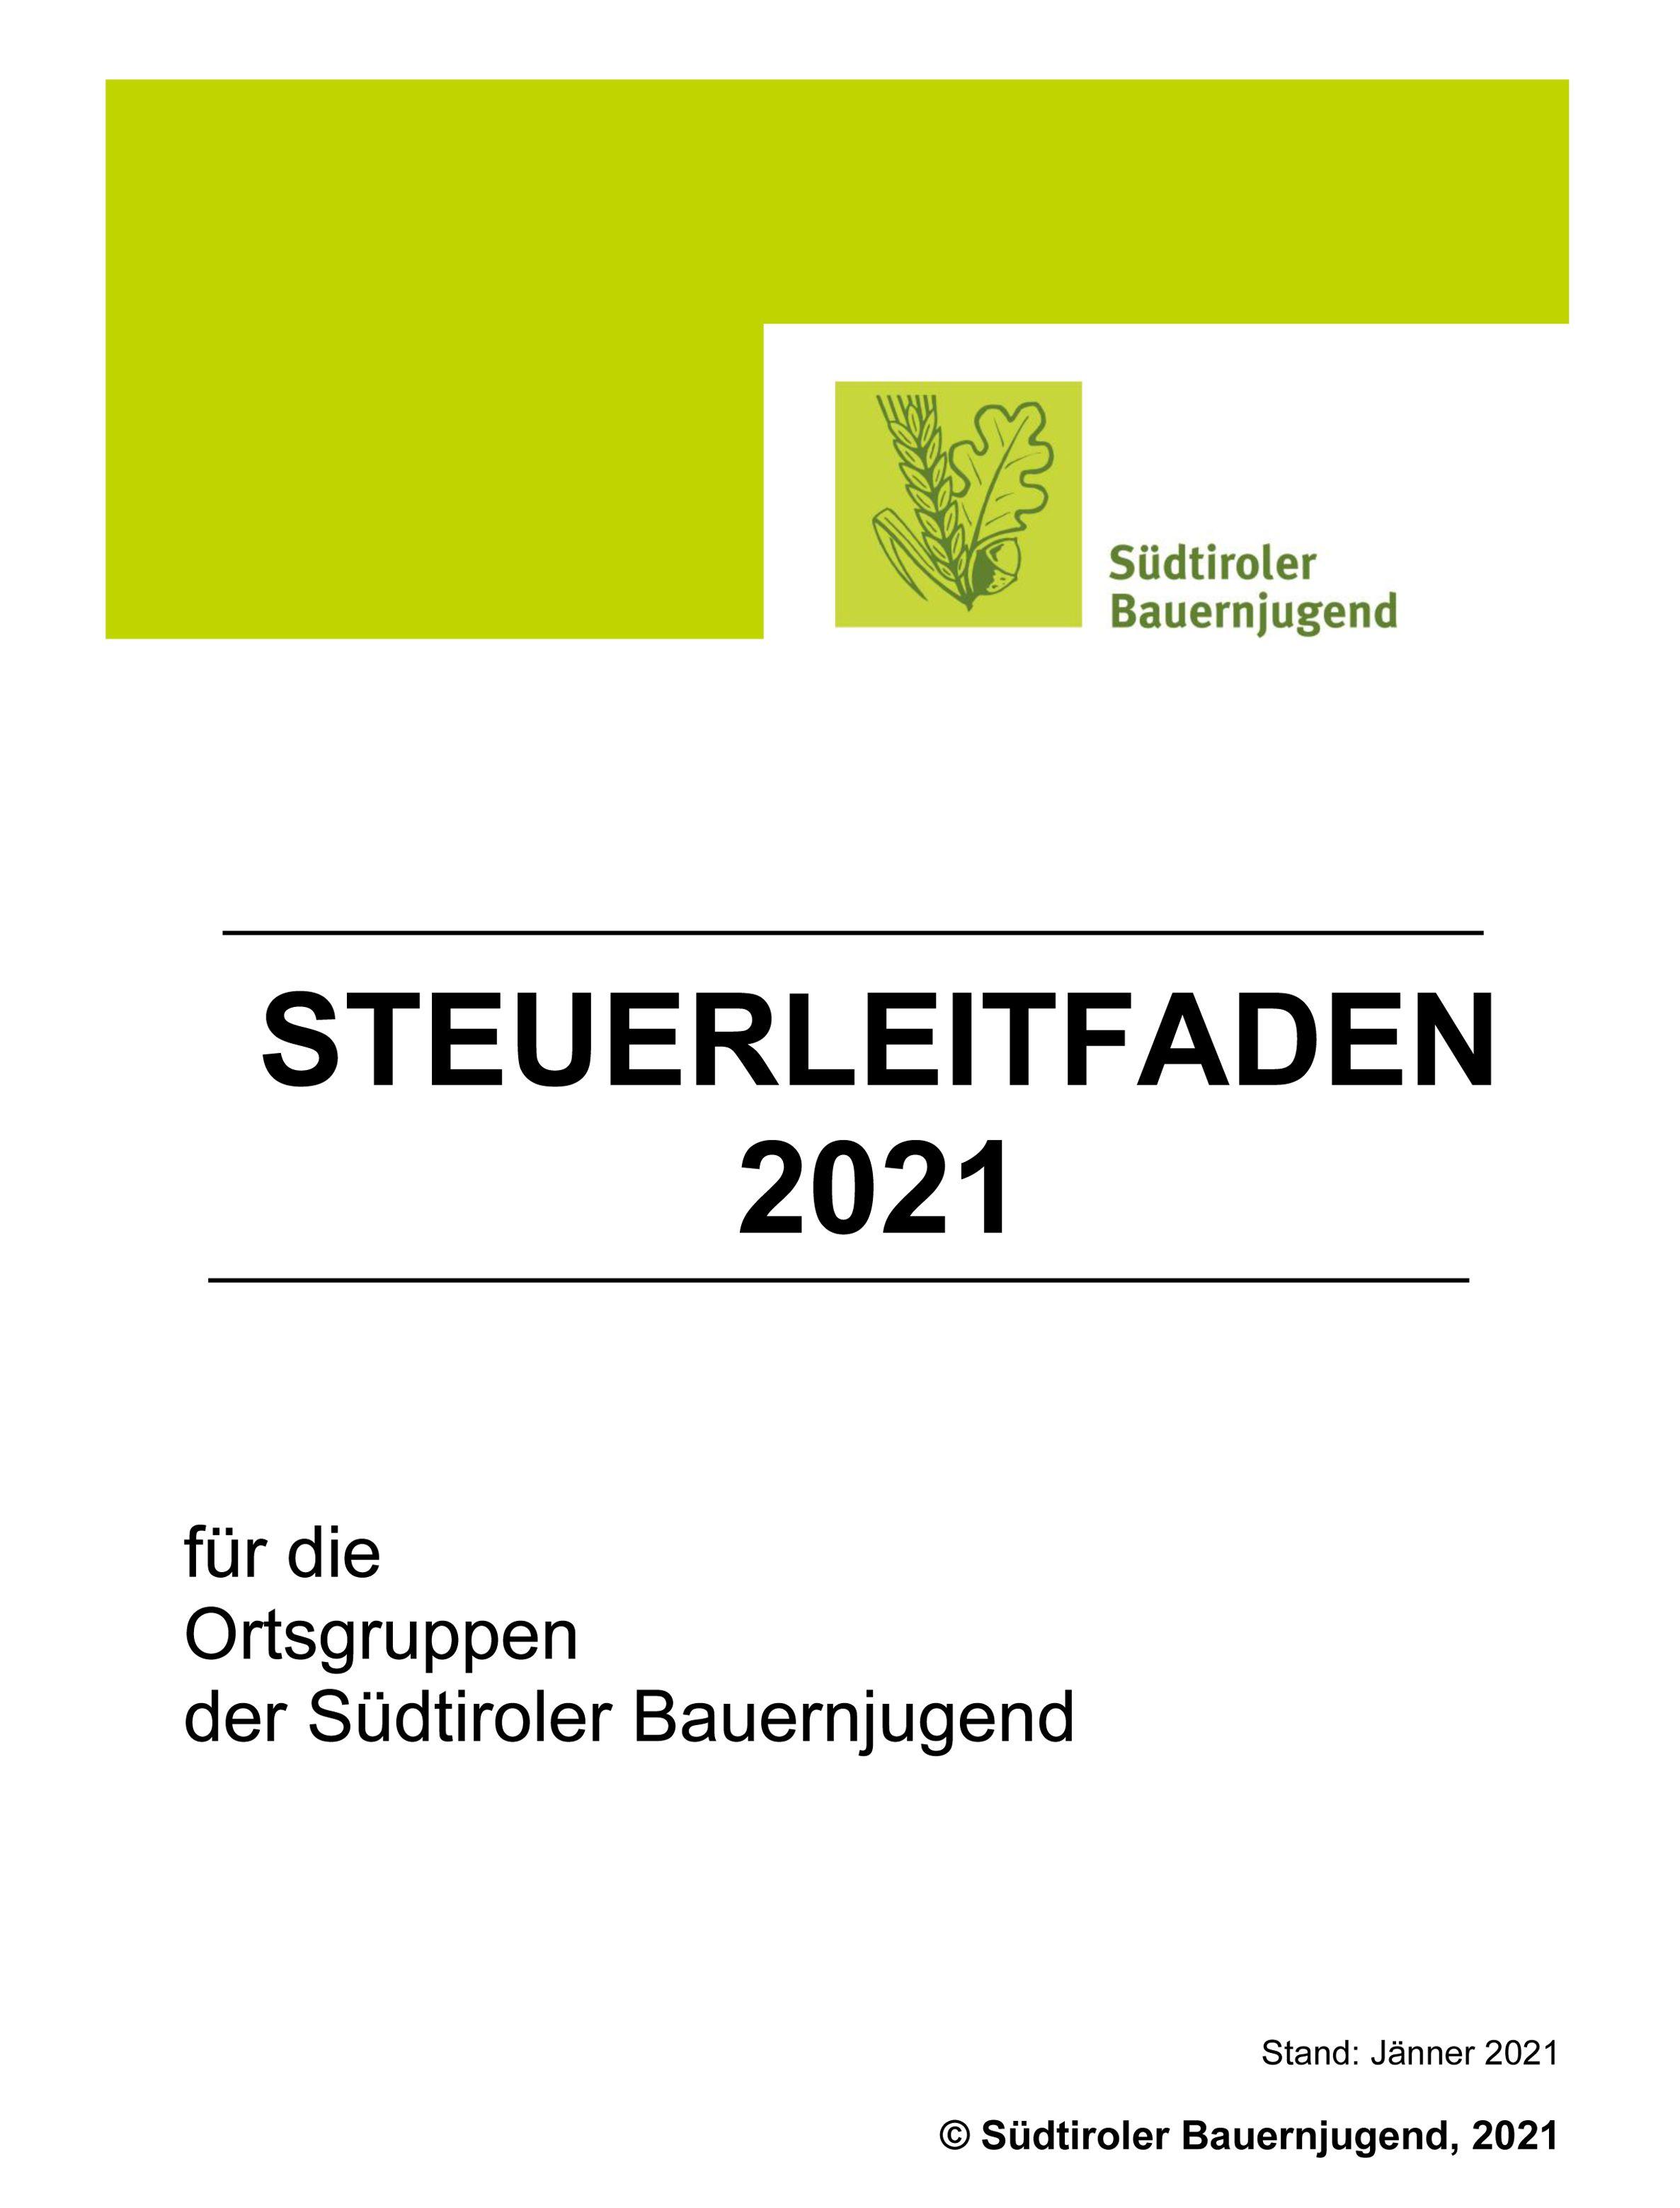 SBJ-Steuerleitfaden_2021-1.jpg